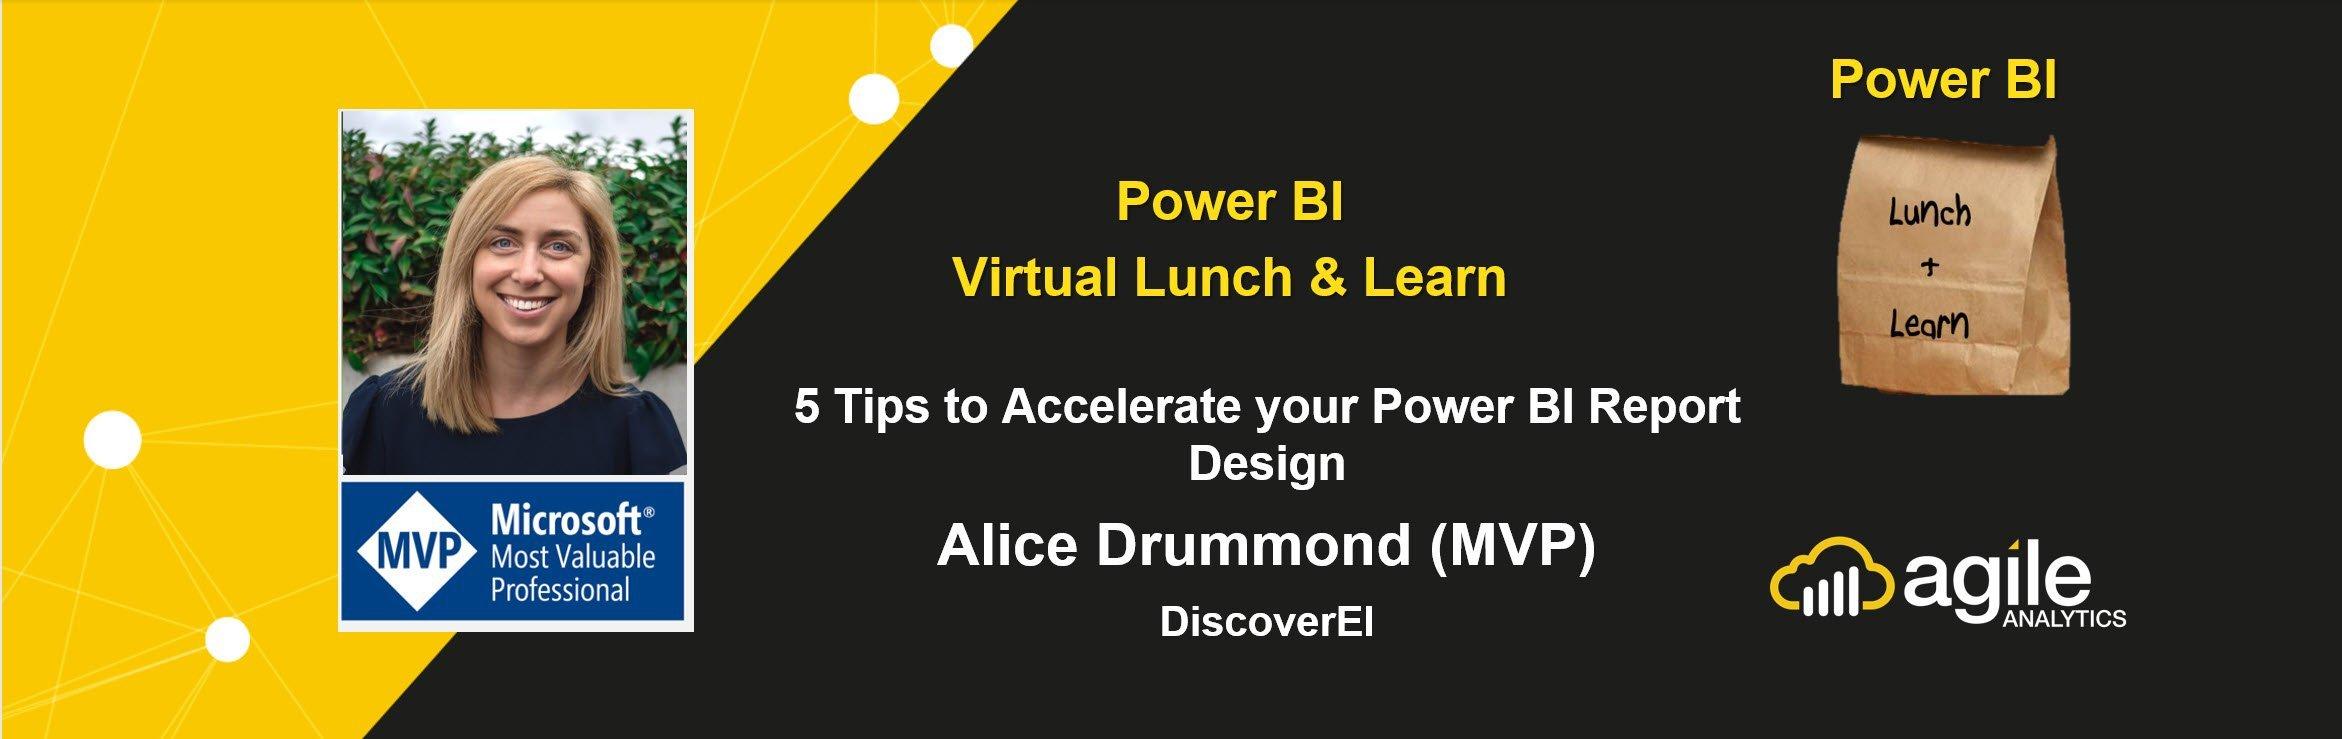 Alice Drummond (MVP) - Power BI Design Tips